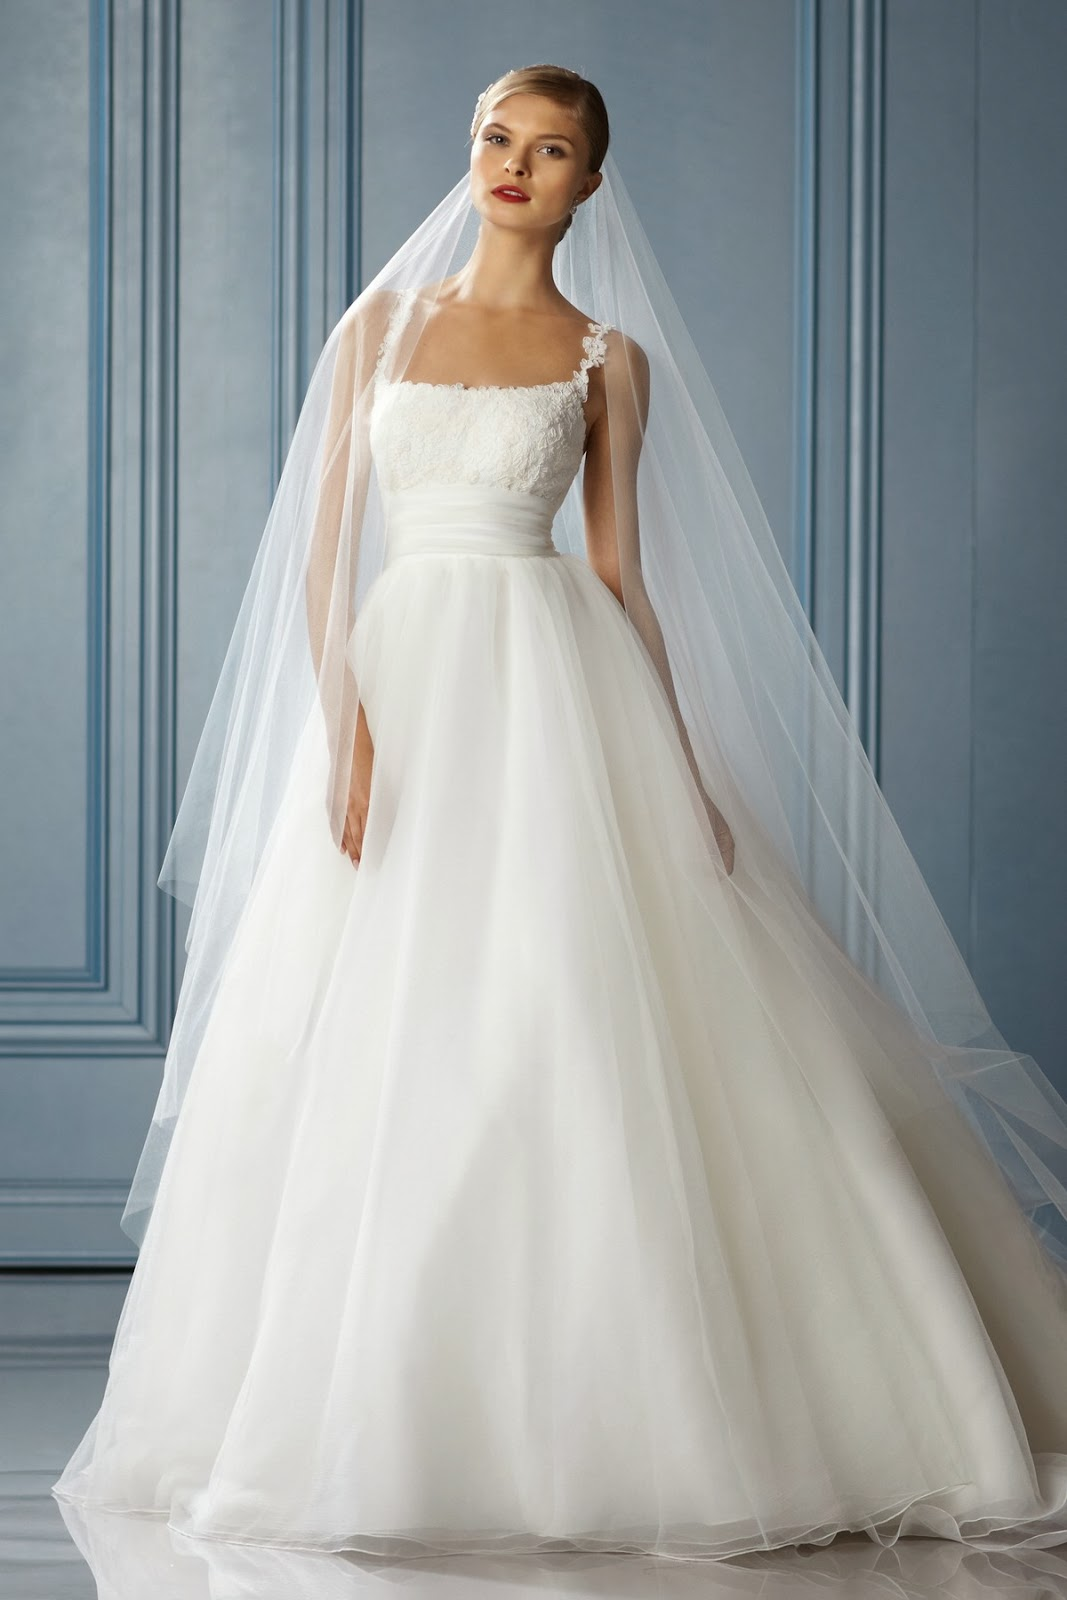 wedding dresses expensive photo - 1